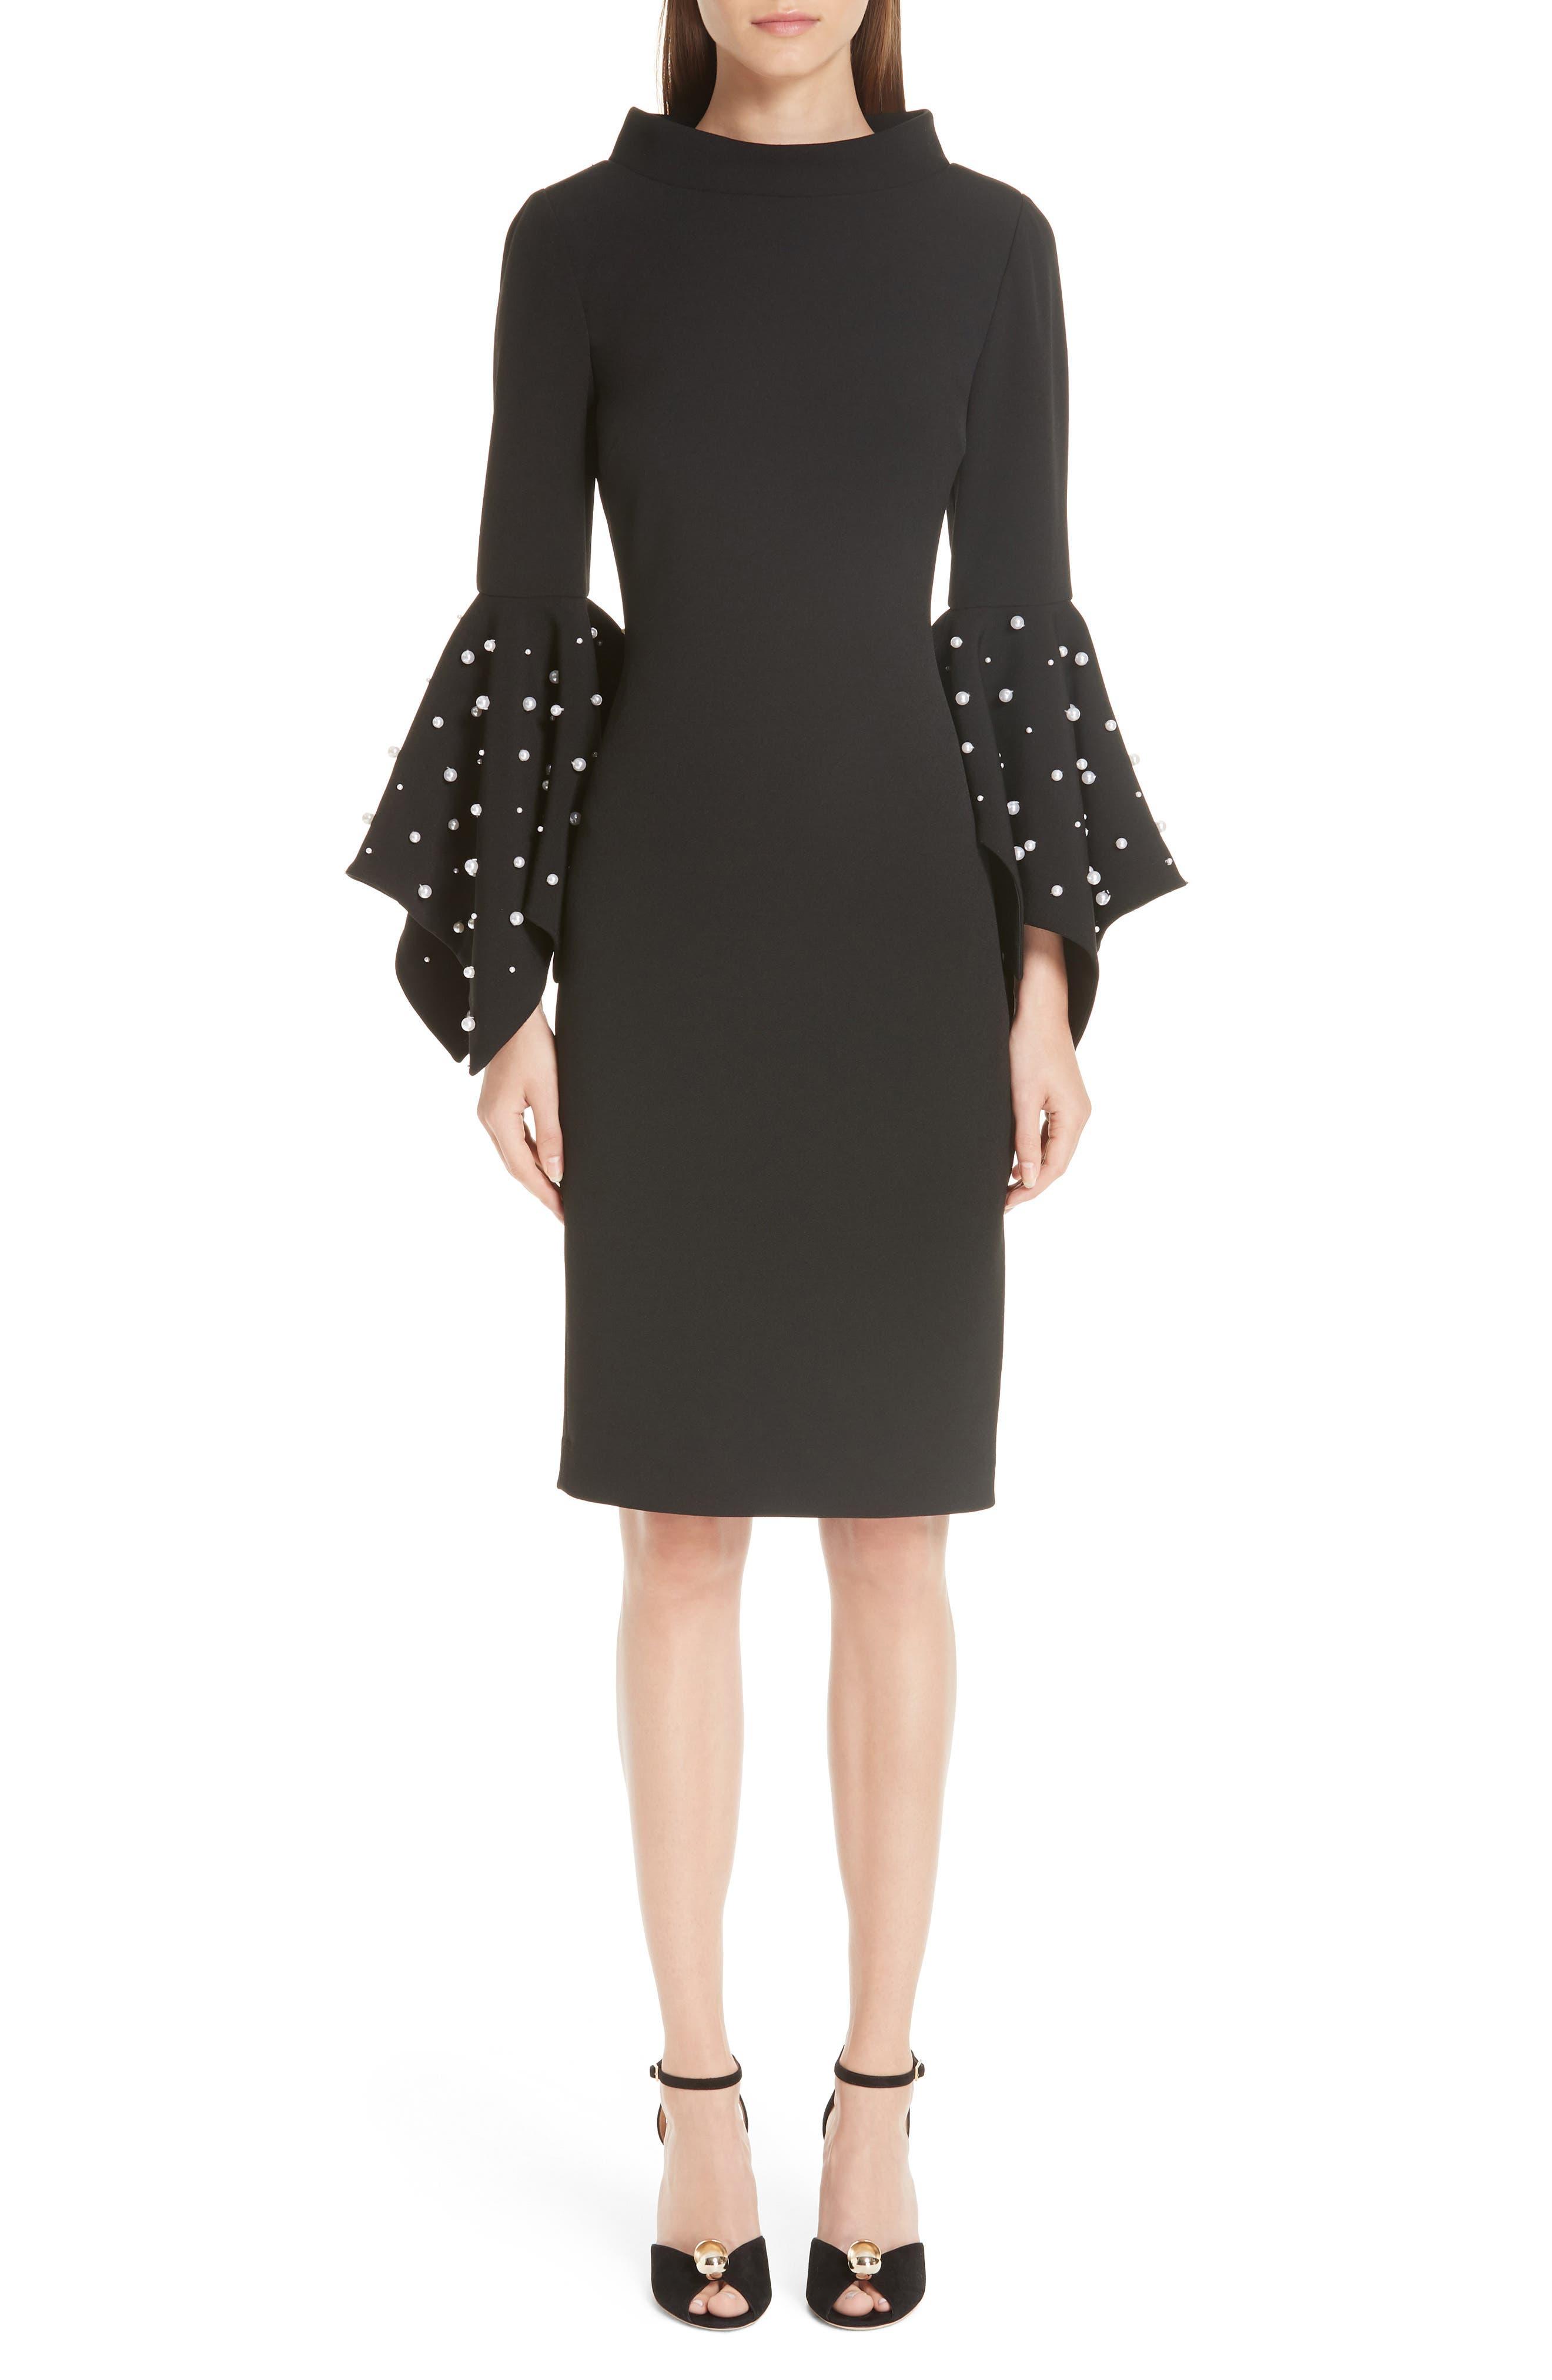 BADGLEY & MISCHKA Collection Beaded Flare Cuff Sheath Dress in Black